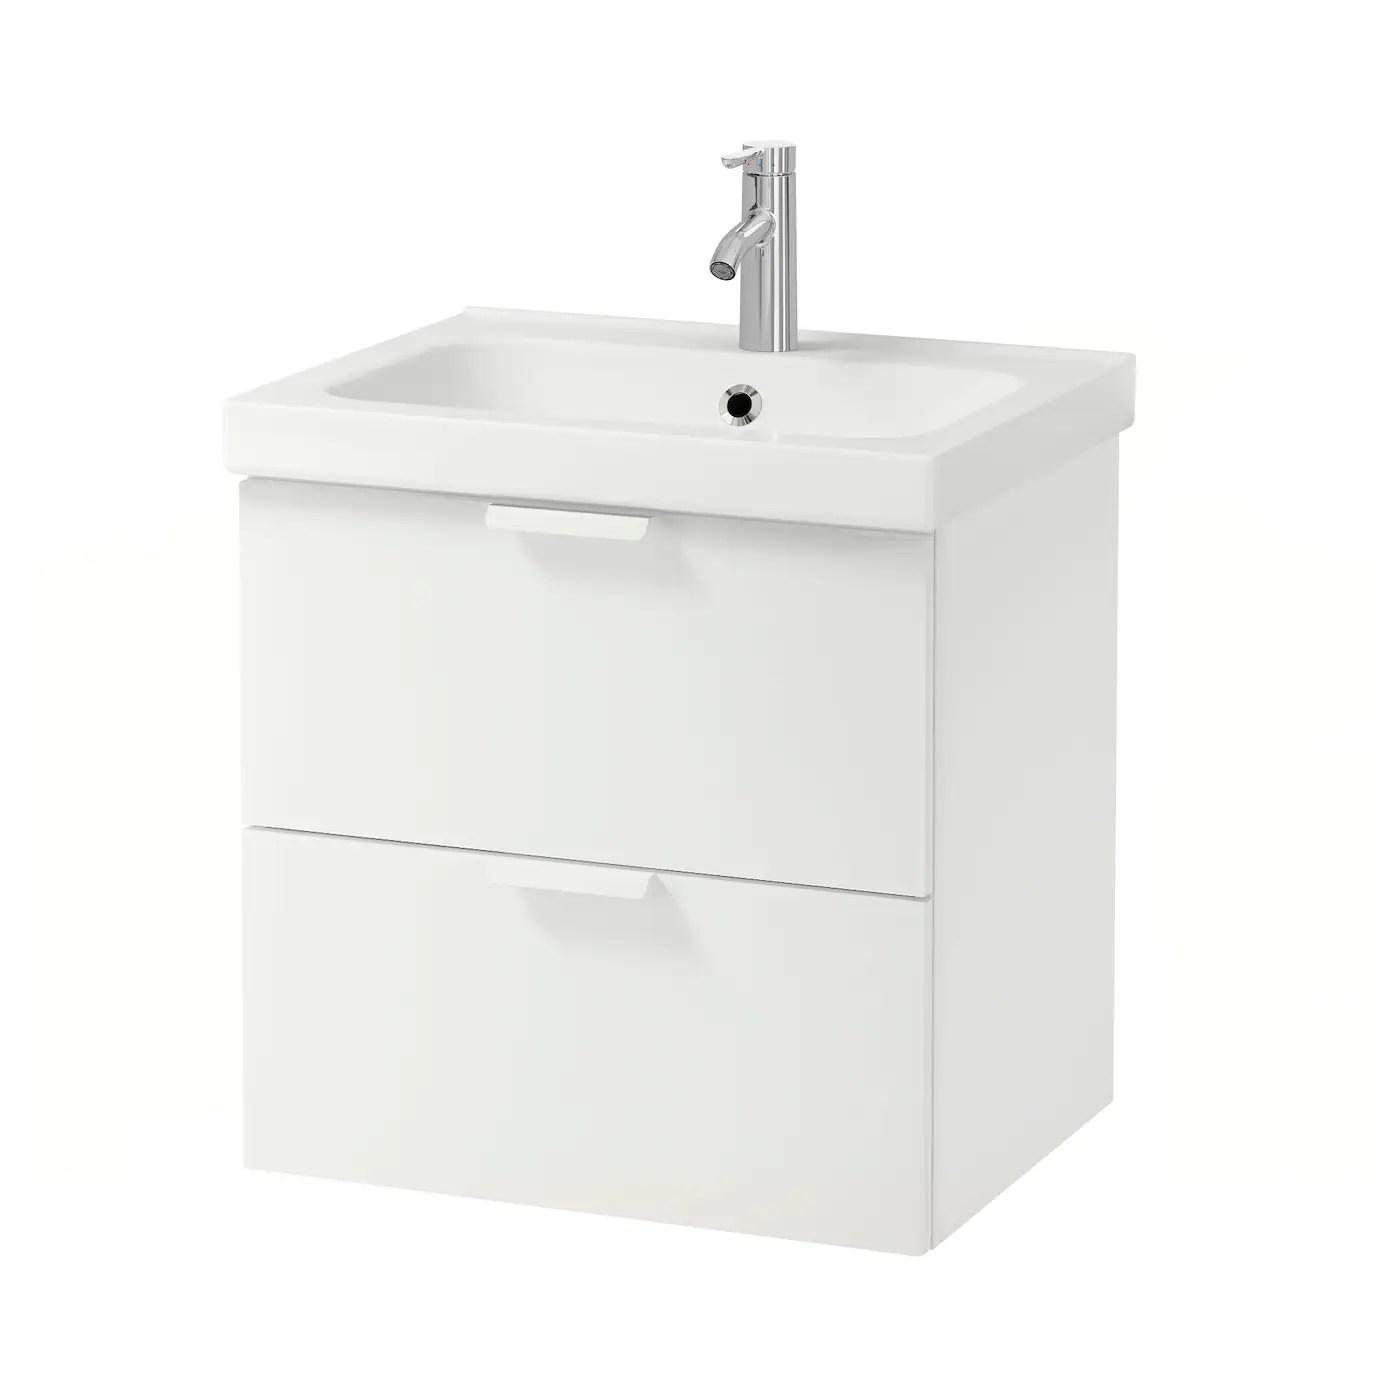 godmorgon odensvik meuble lavabo 2tir blanc dalskar mitigeur lavabo 63x49x64 cm